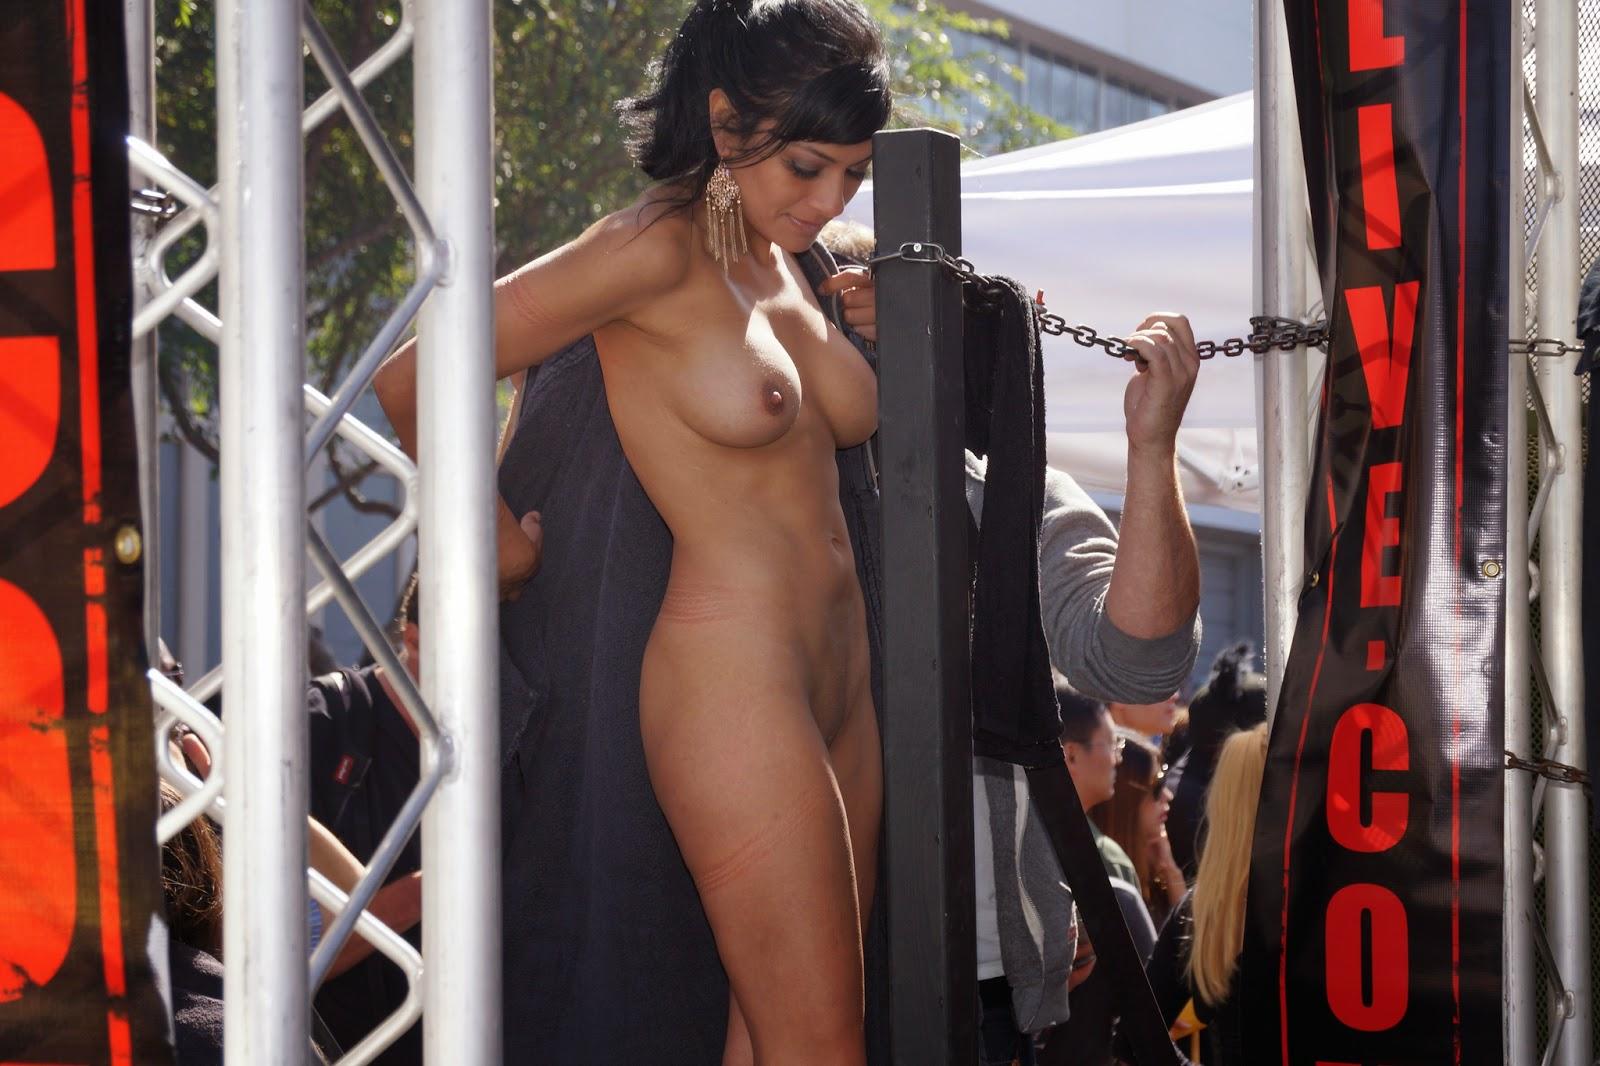 Naked public street nude